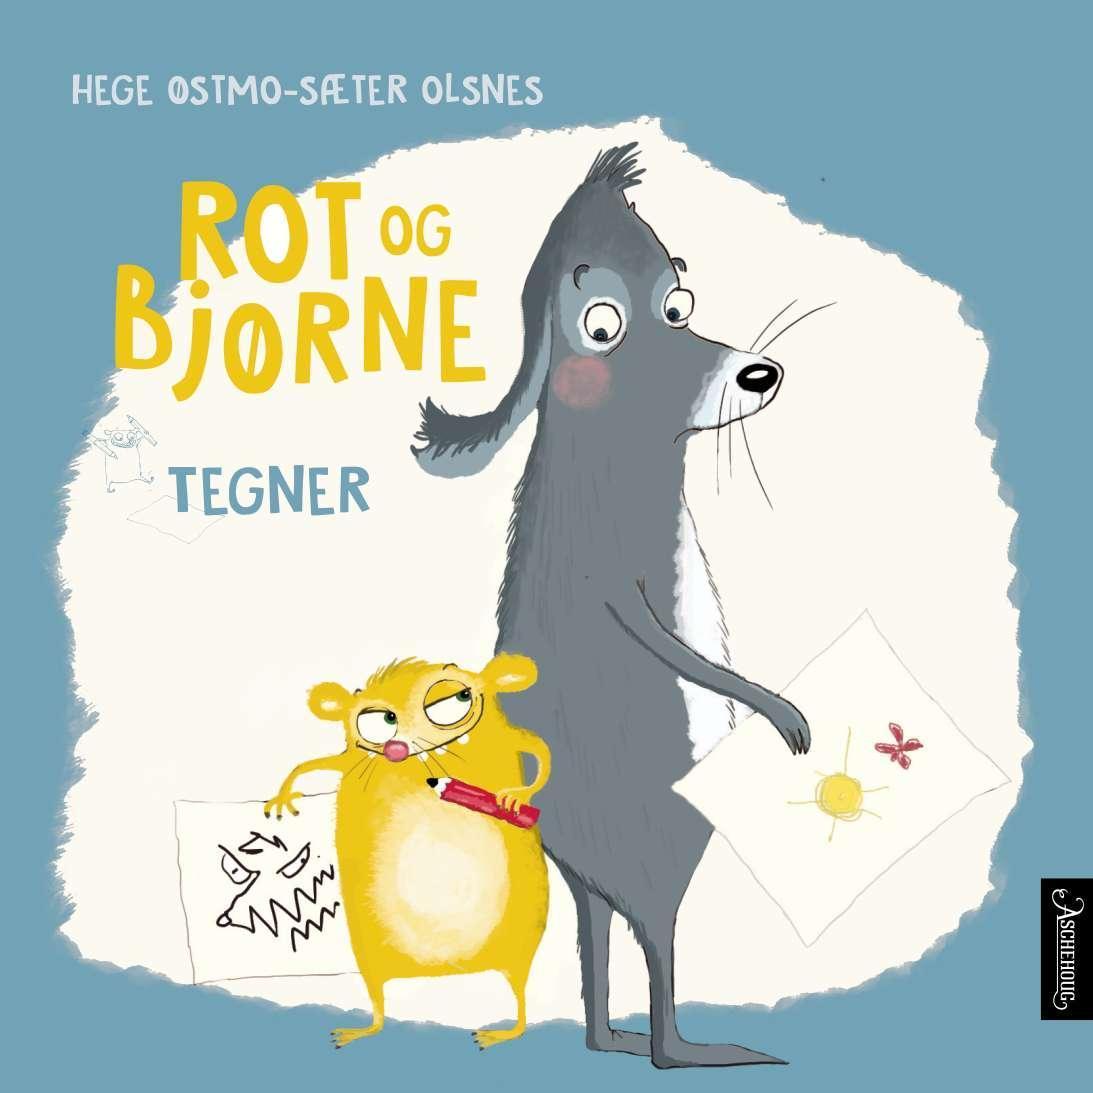 """Rot og Bjørne tegner"" av Hege Østmo-Sæter Olsnes"